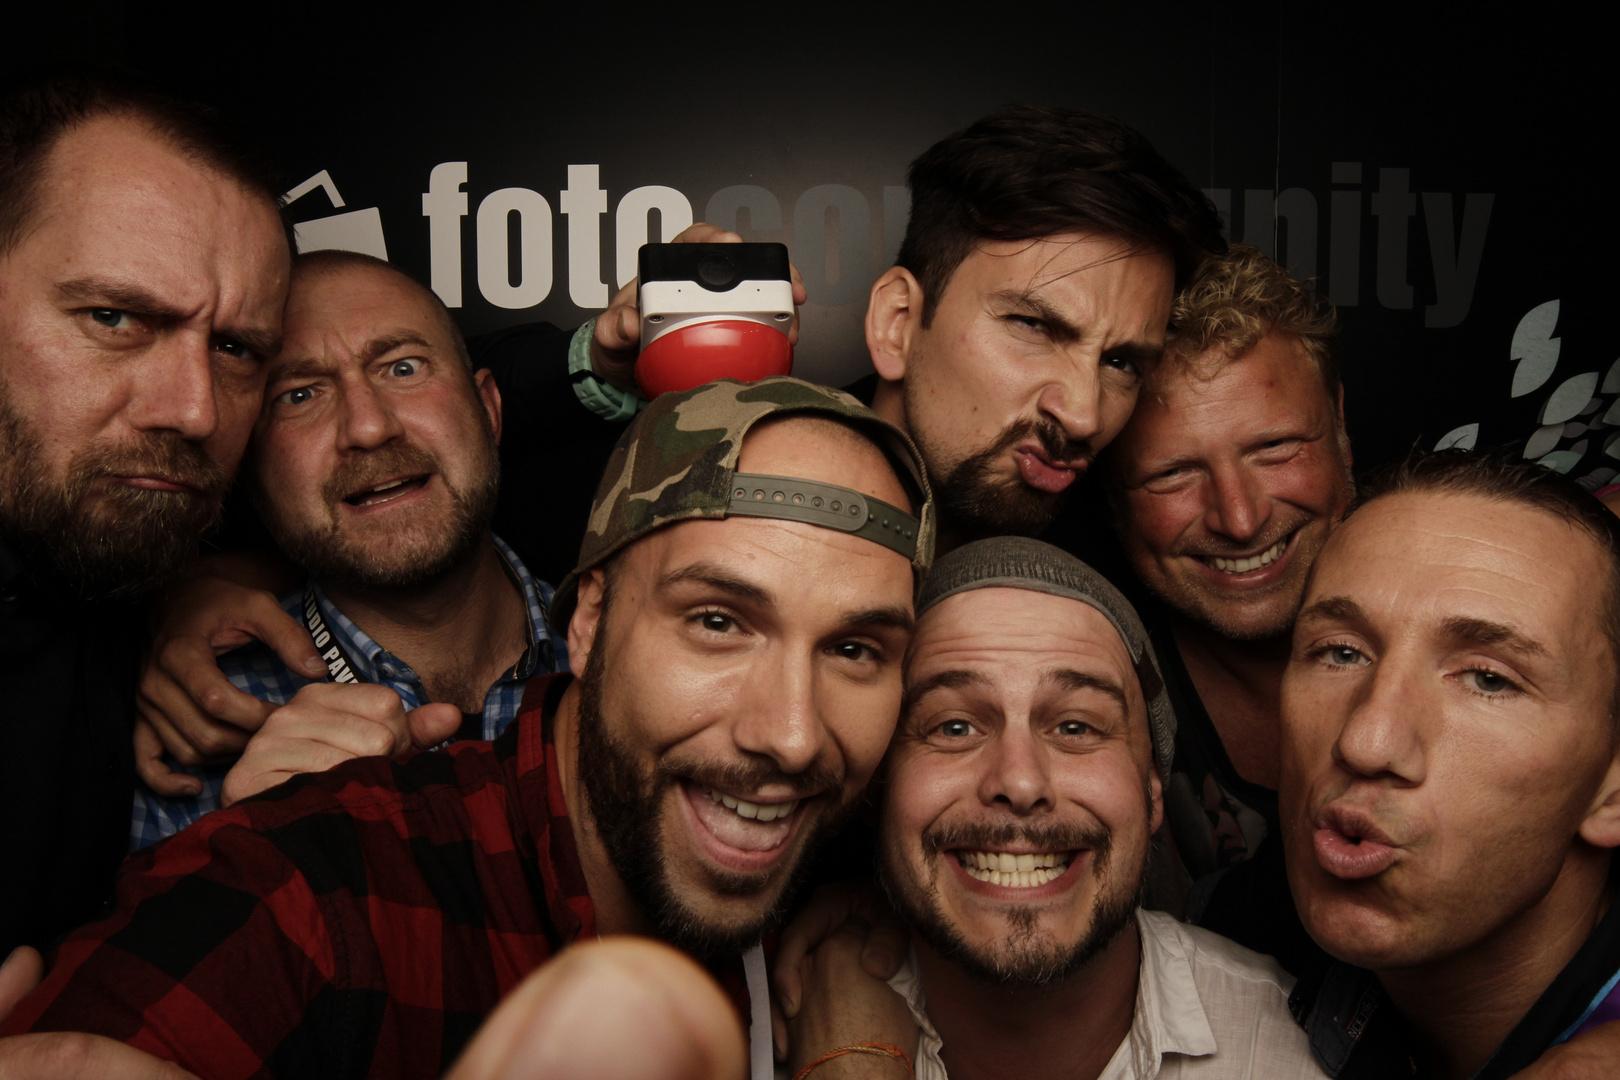 fotocommunity-Standparty – die VIPs in der Photobooth